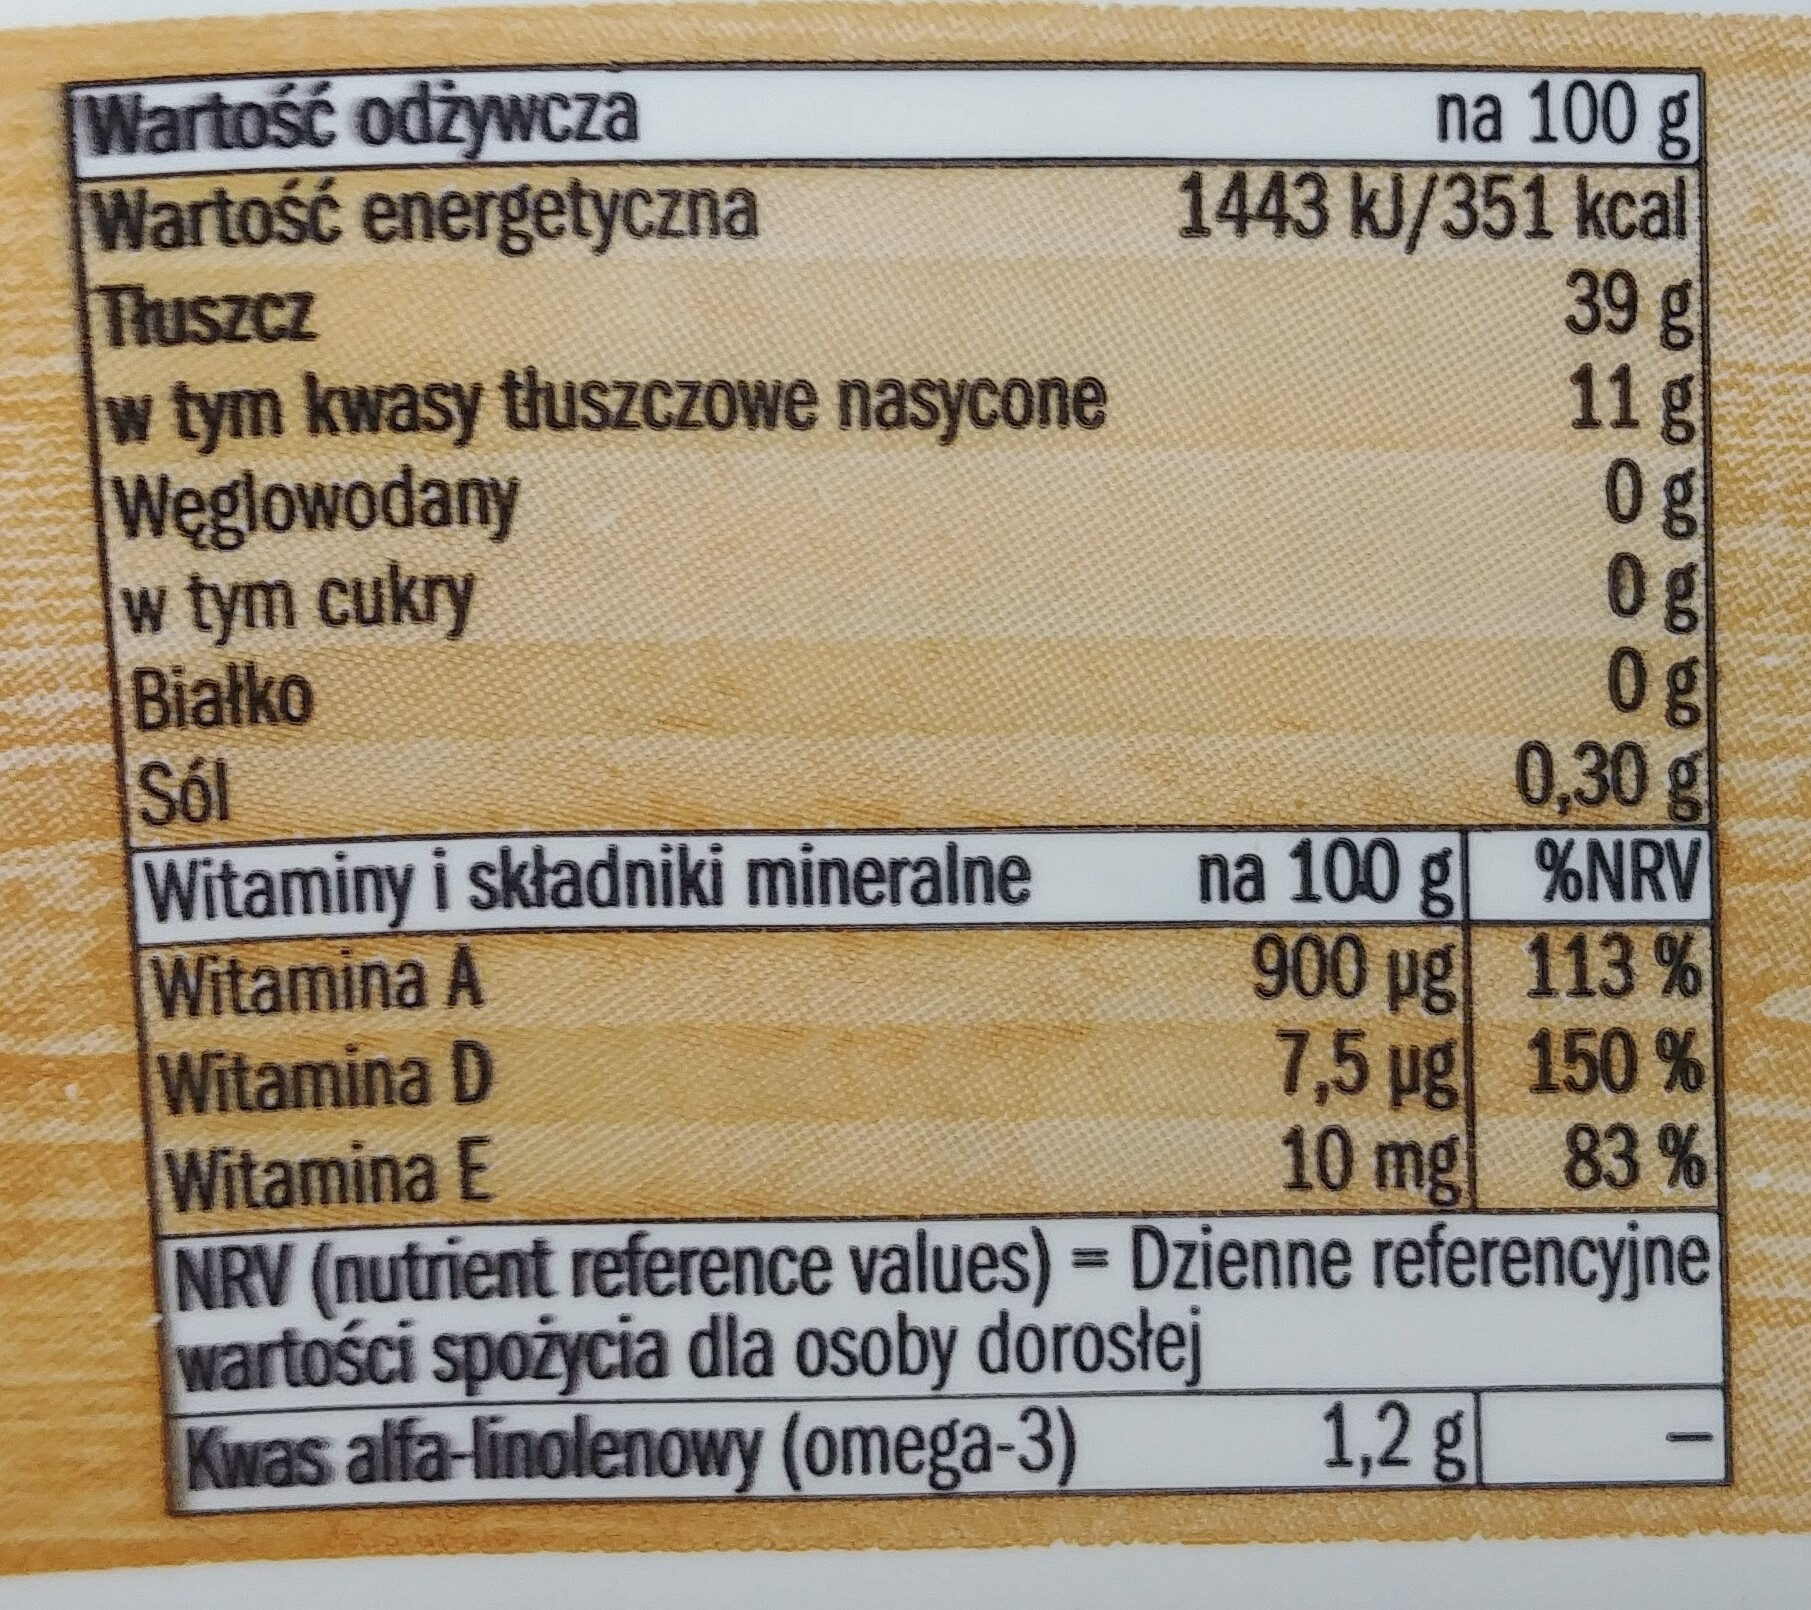 Margaryna lekka 39 %. - Nutrition facts - pl